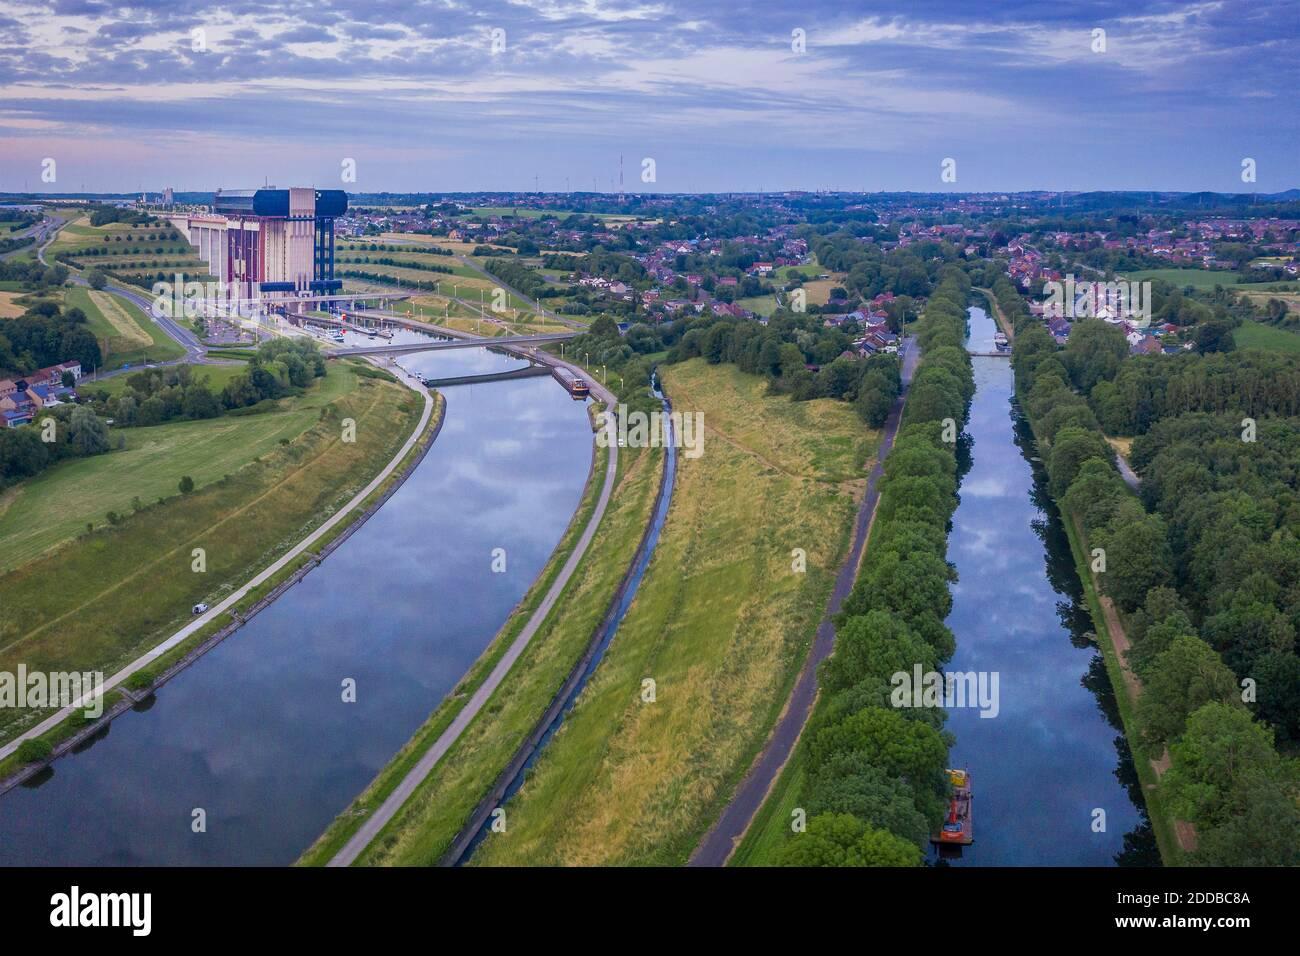 Bélgica, Provincia de Hainaut, Vista aérea del Canal du Centre y elevador de barcos Strepy-Thieu Foto de stock